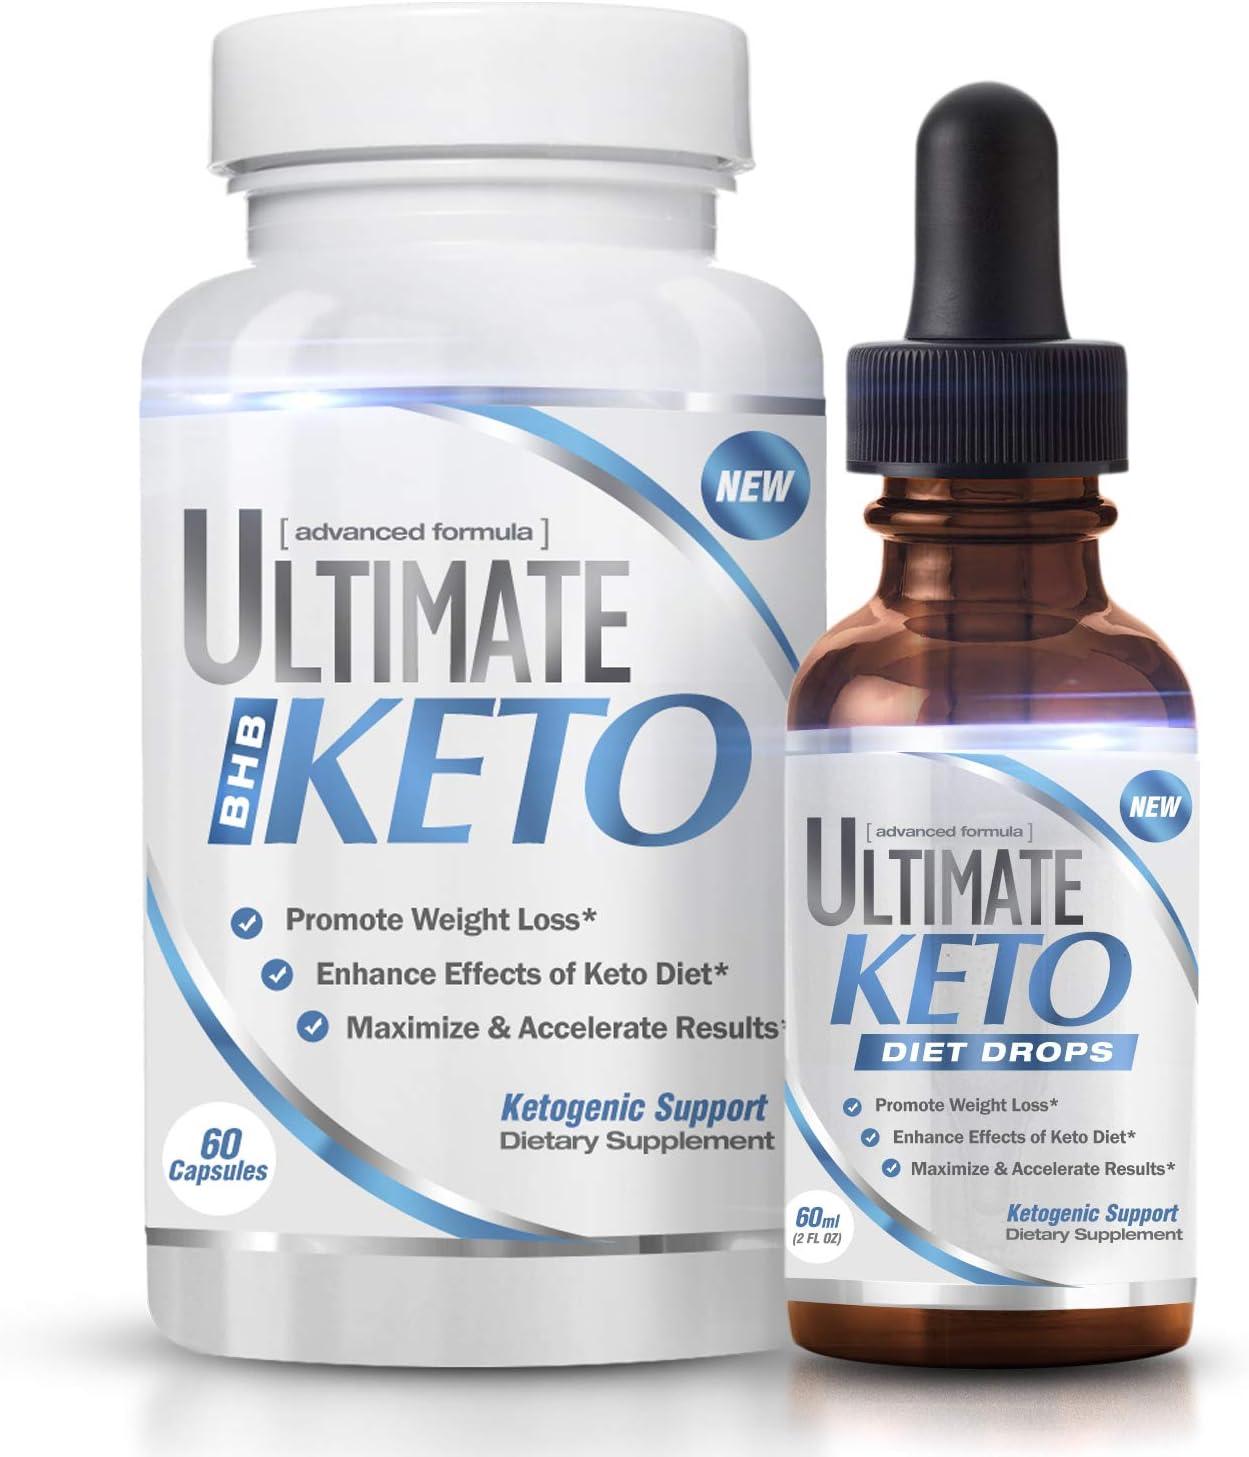 ultimate keto diet drops